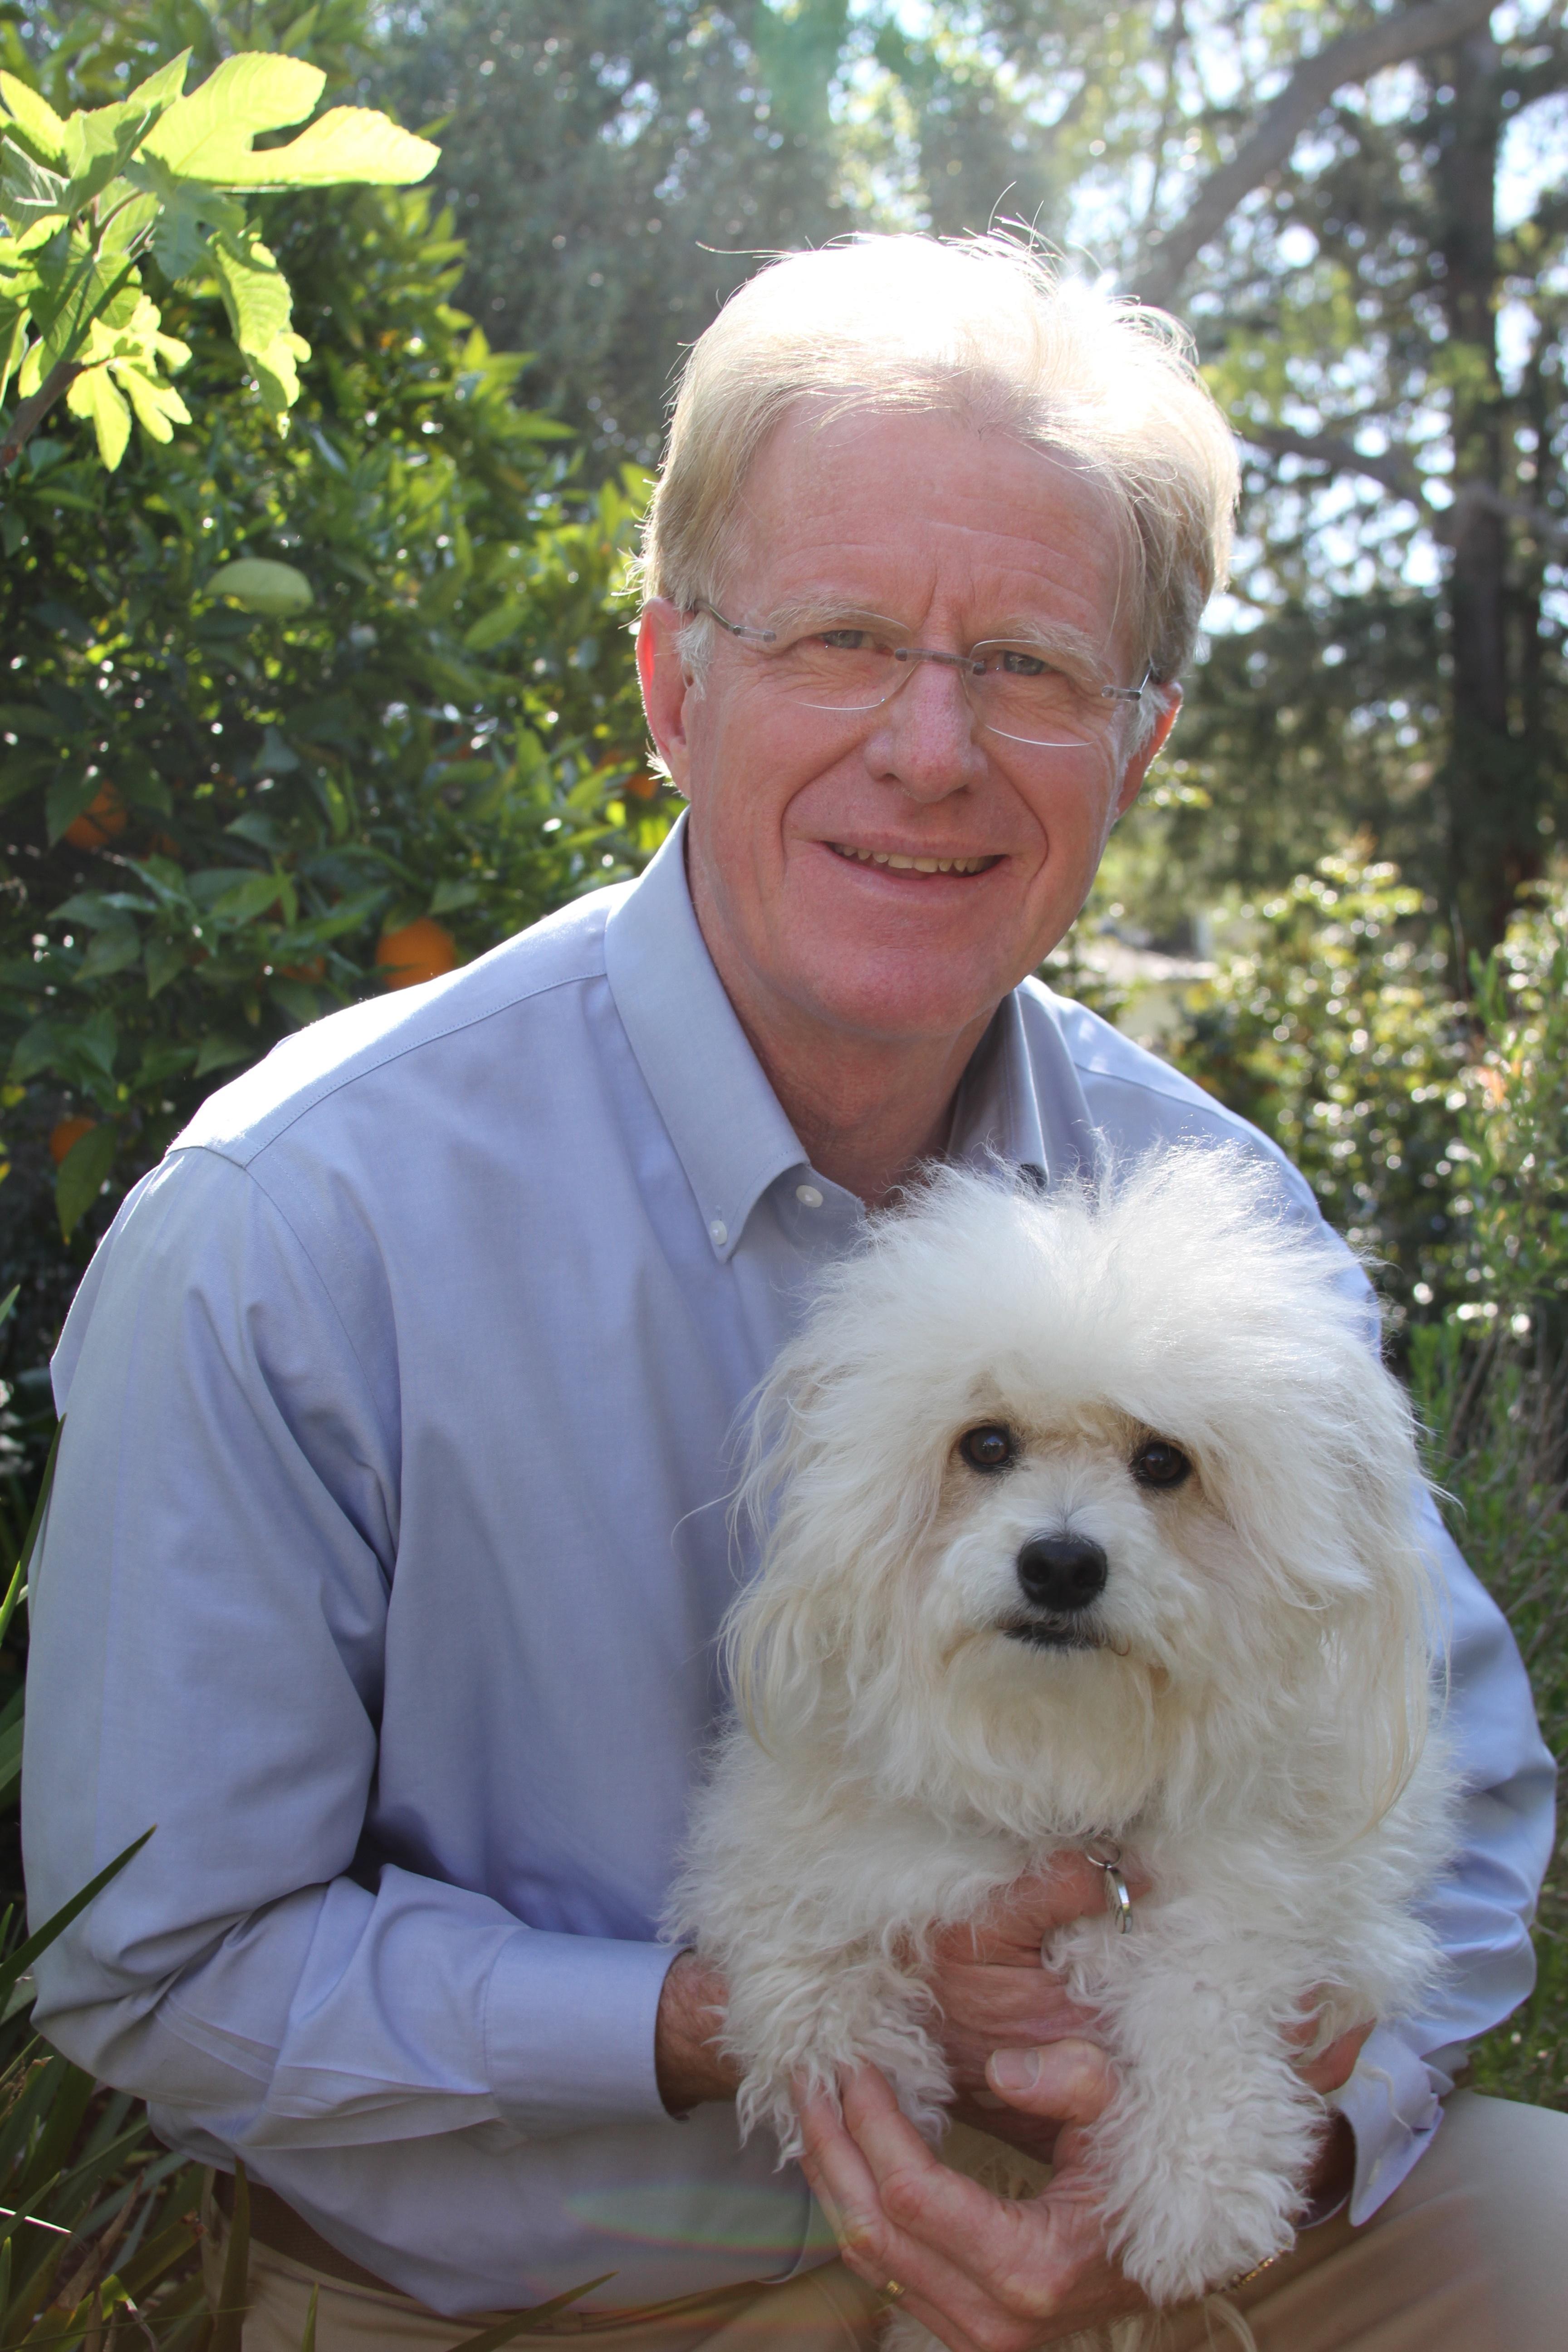 Ed Begley and his dog Bernie go green!